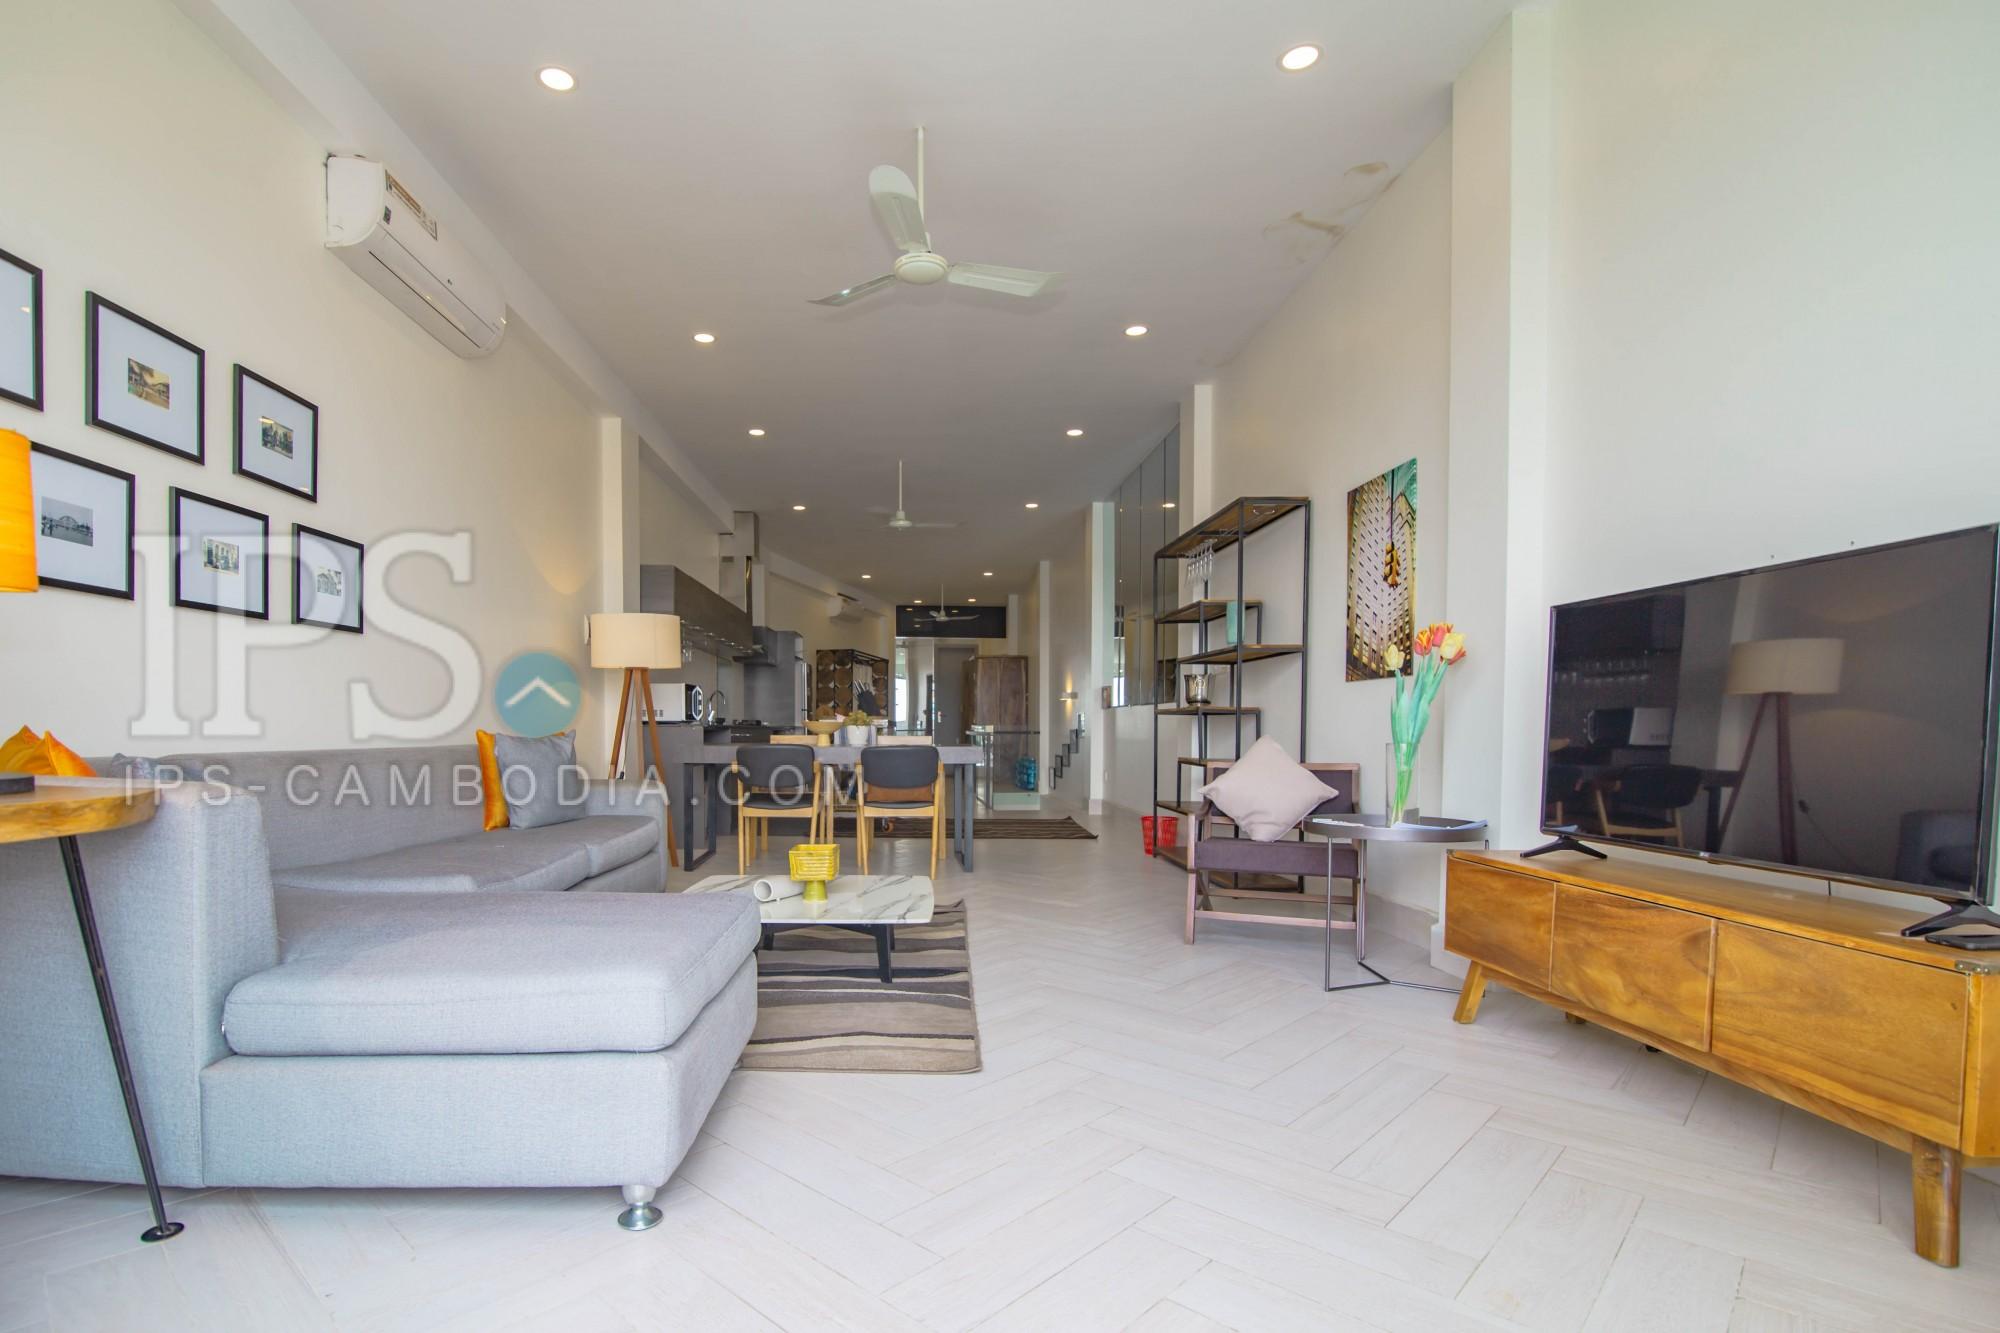 2 Bedroom Apartment For Rent - Riverside, Phnom Penh